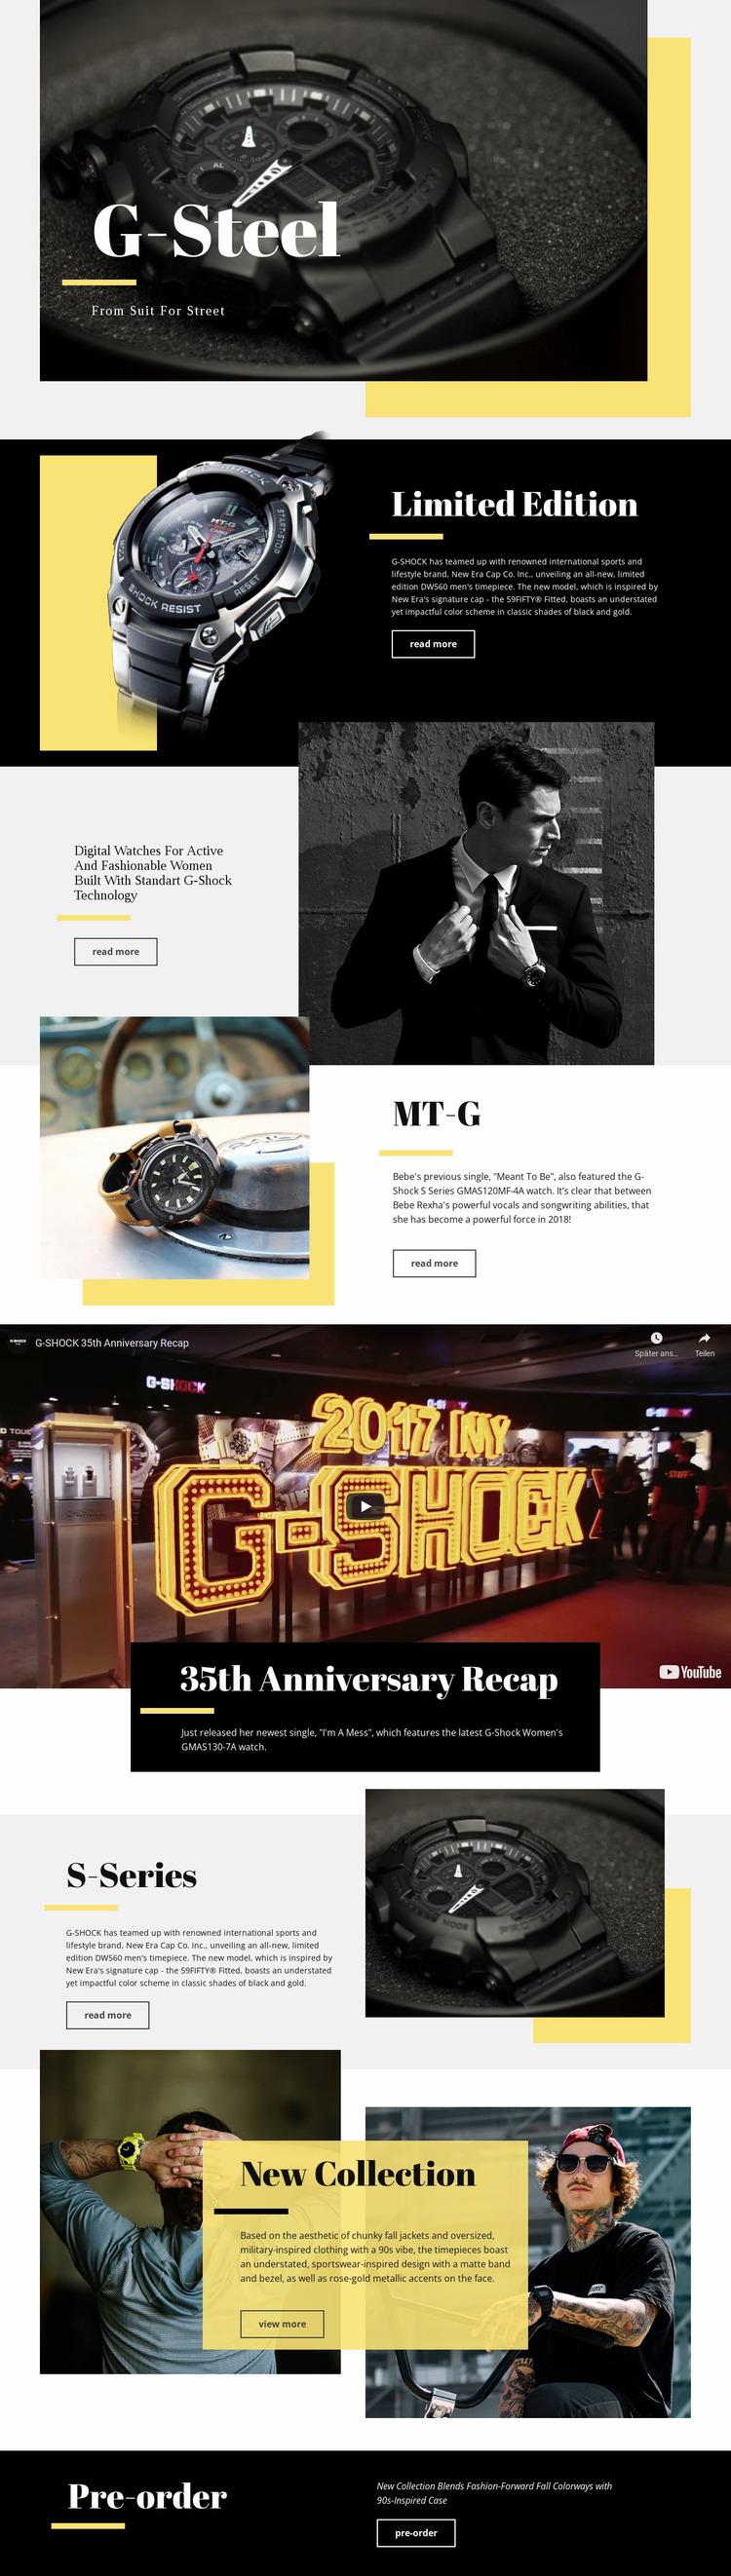 G-Steel Website Mockup